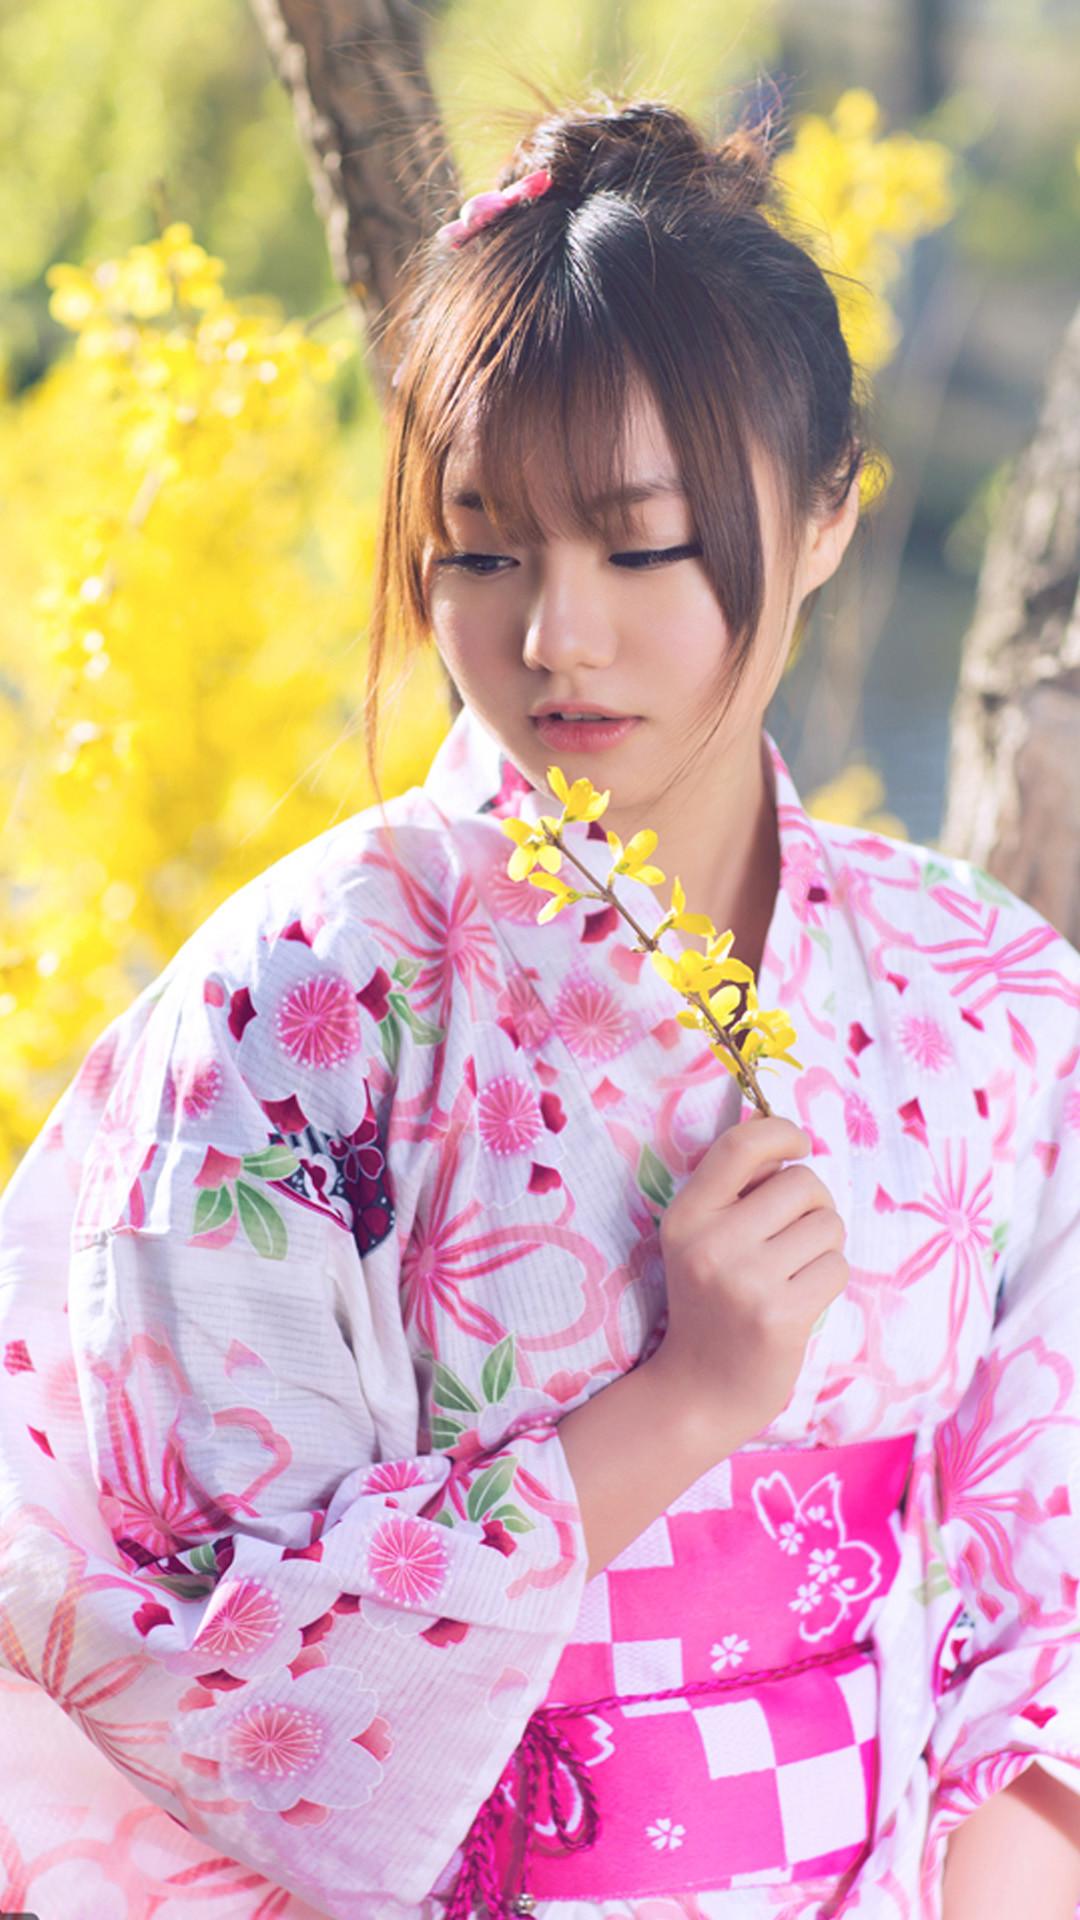 Cute Japanese girl iphone 6 plus wallpaper | iPhone 6 Plus Wallpapers .